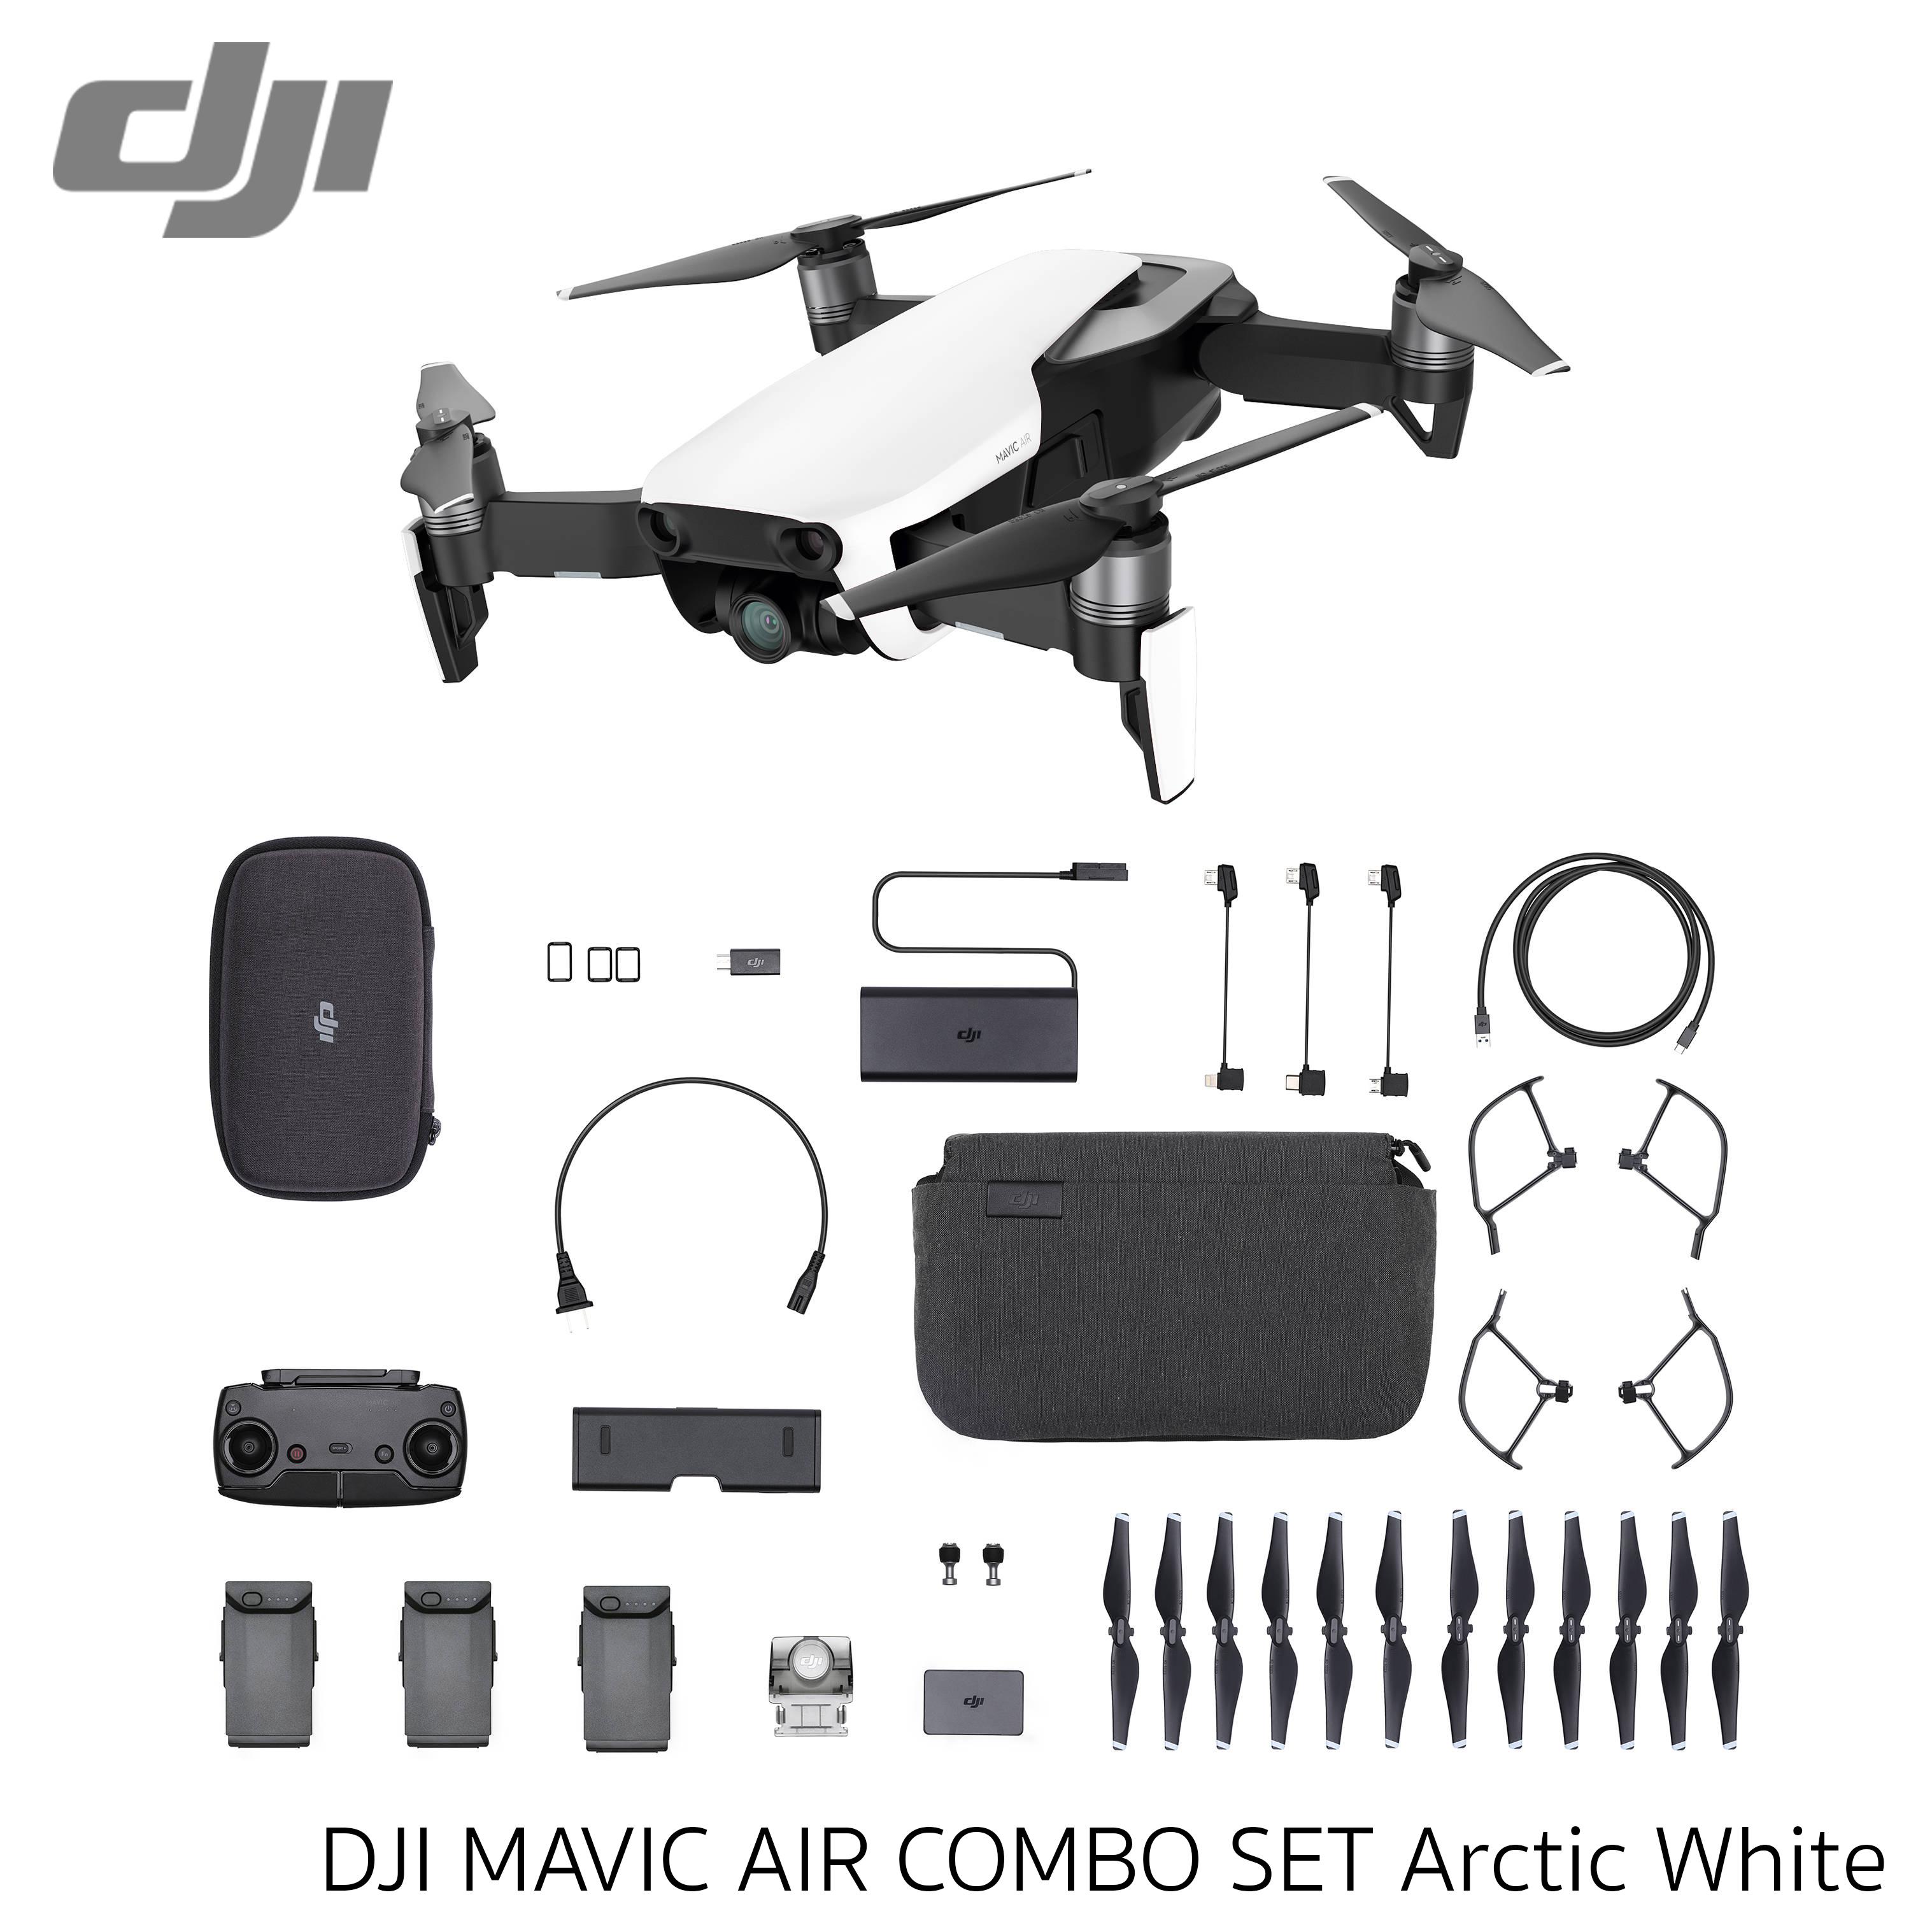 DJI MAVIC AIR COMBO SET (Arctic White )